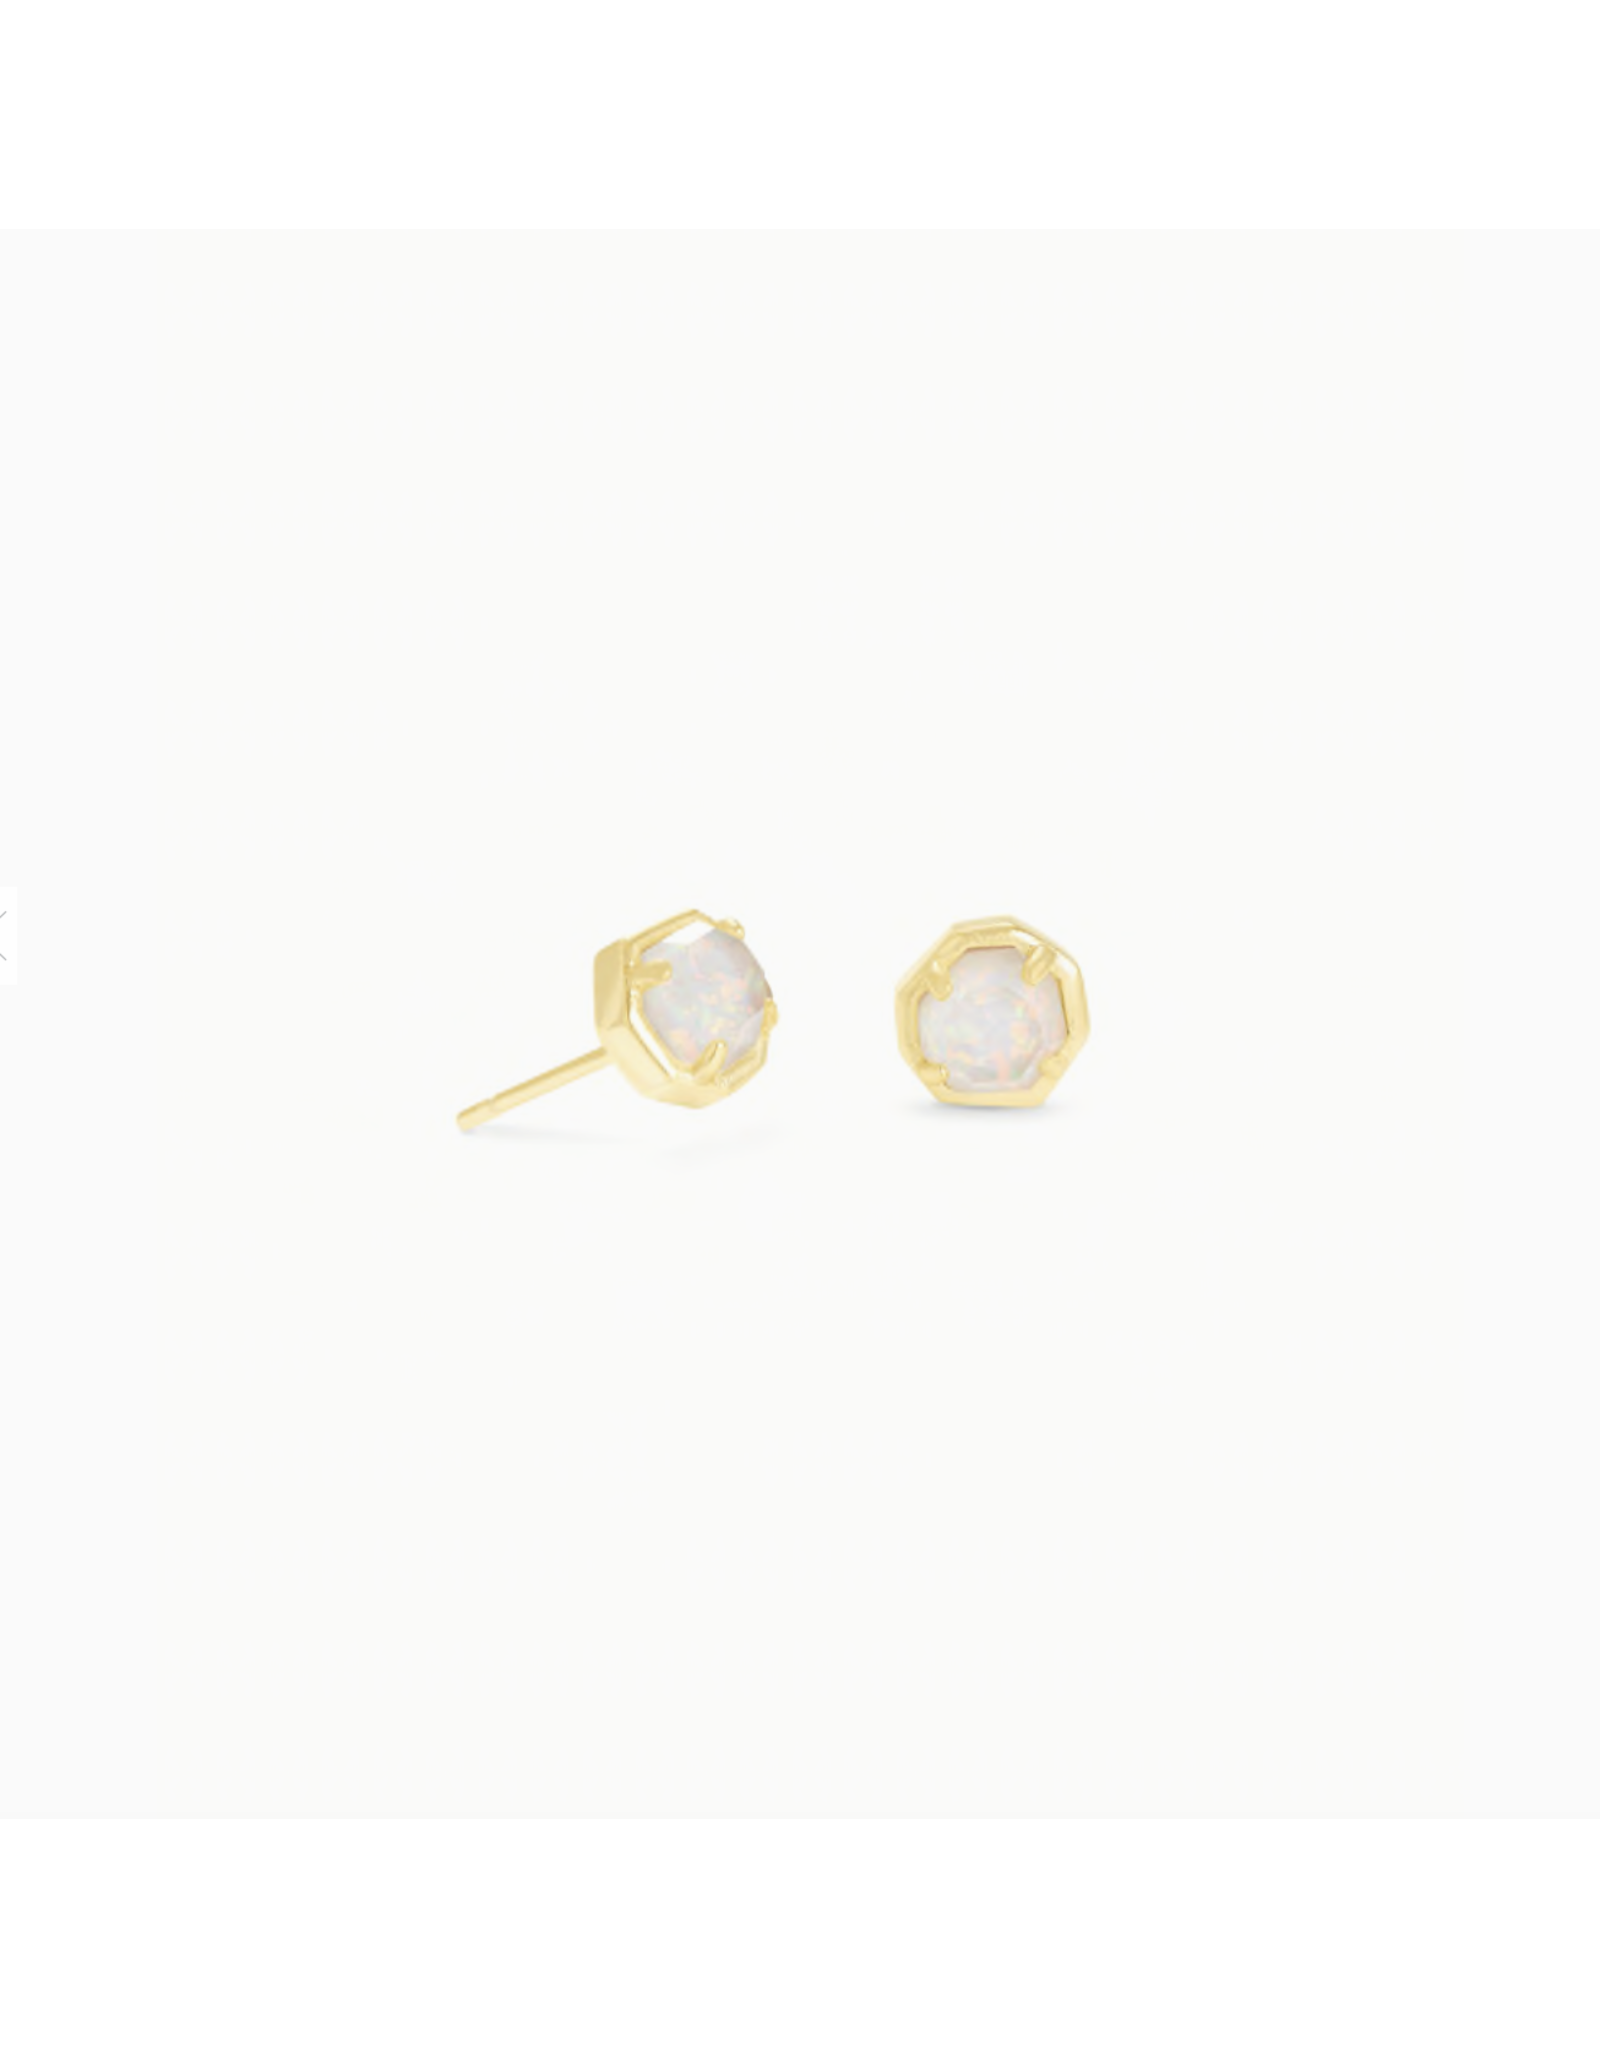 Kendra Scott Earring Nola Stud Gold White Opal Illusion